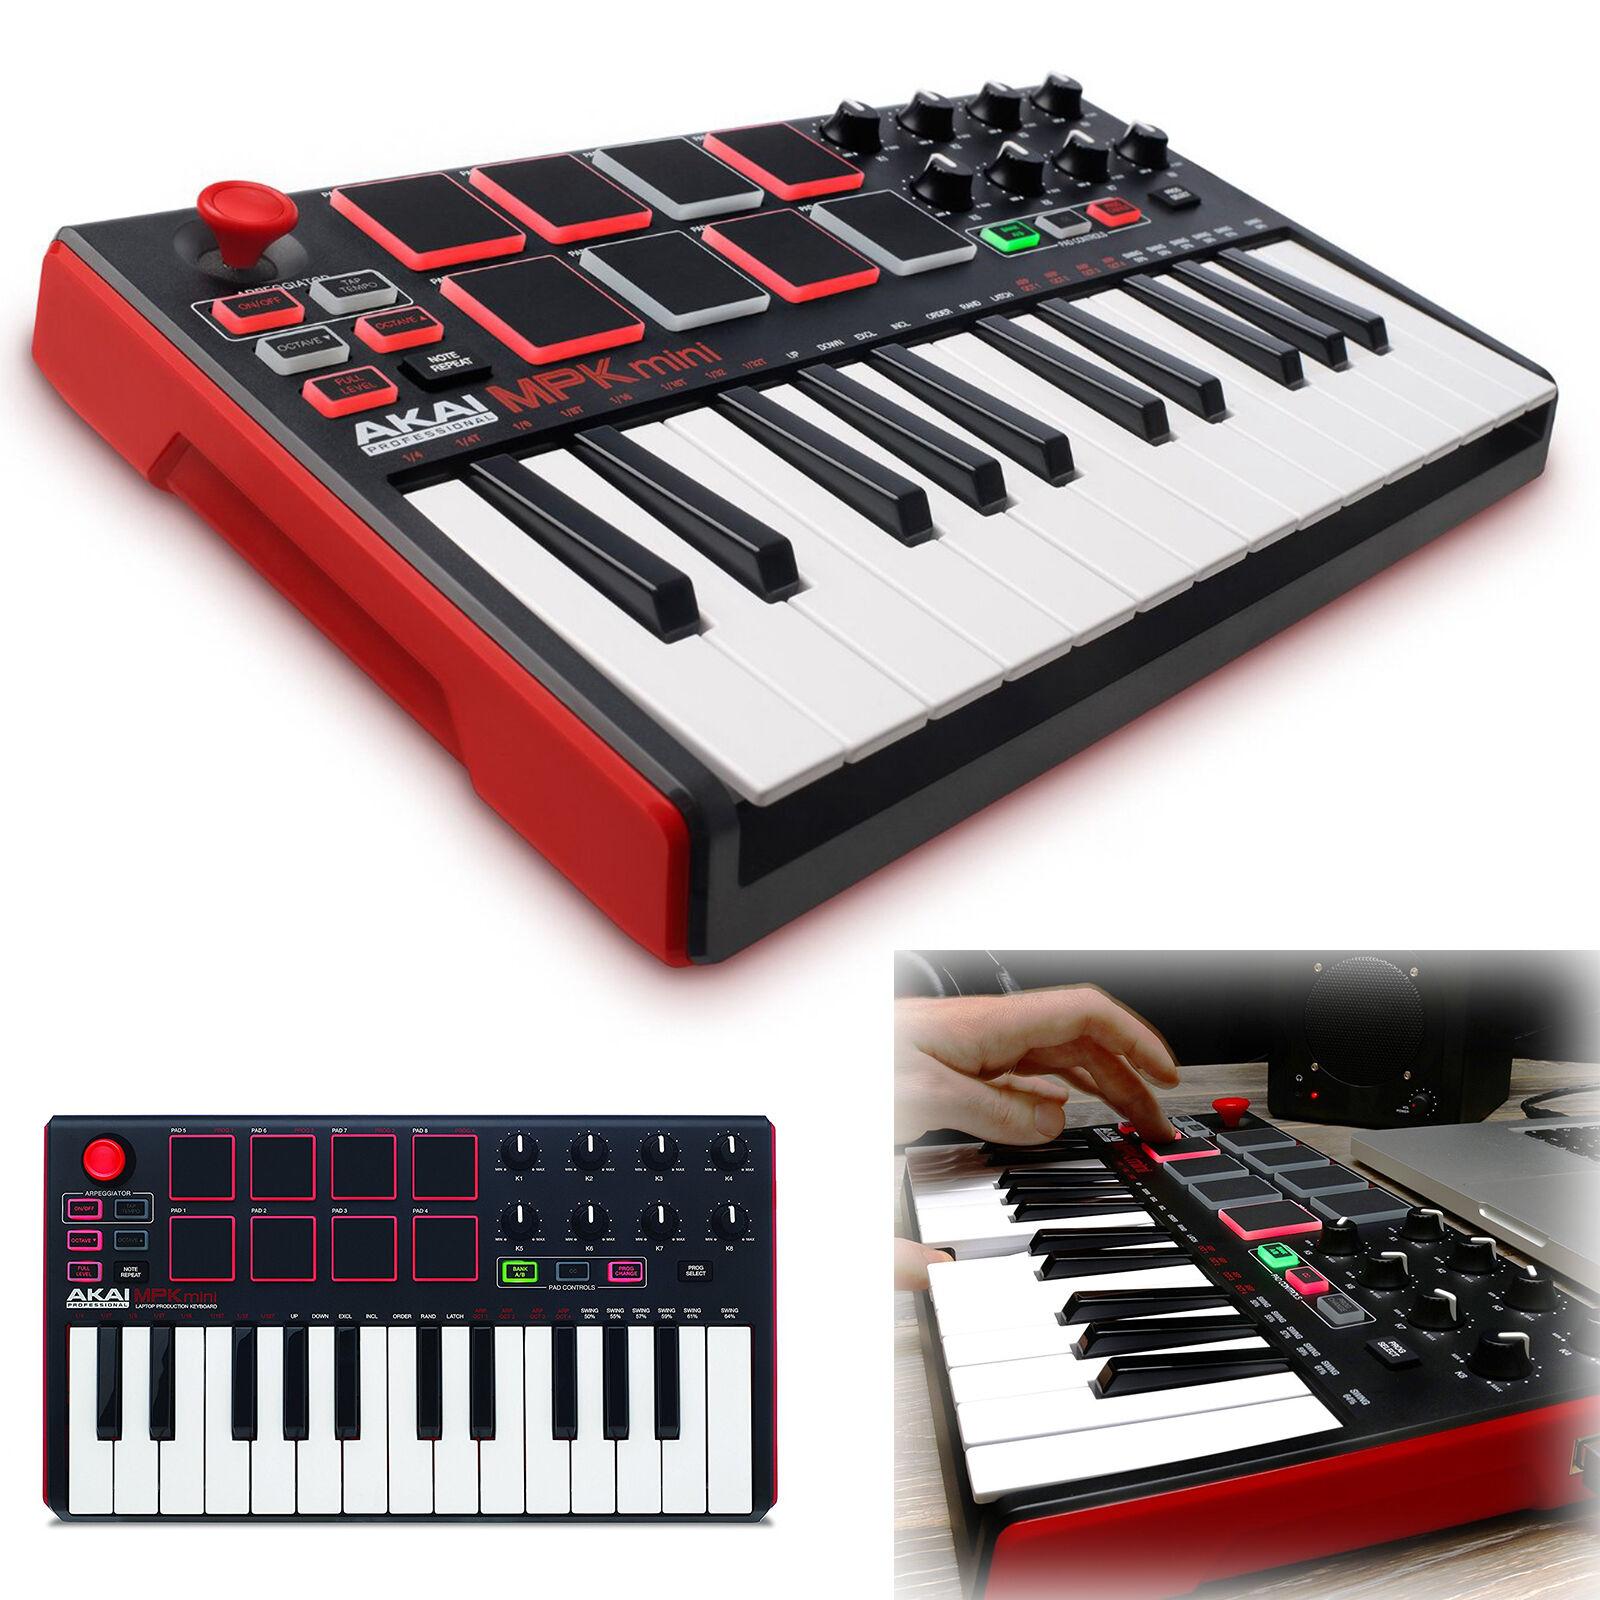 MIDI Controller Keyboard 25 Key USB Professional Piano Music